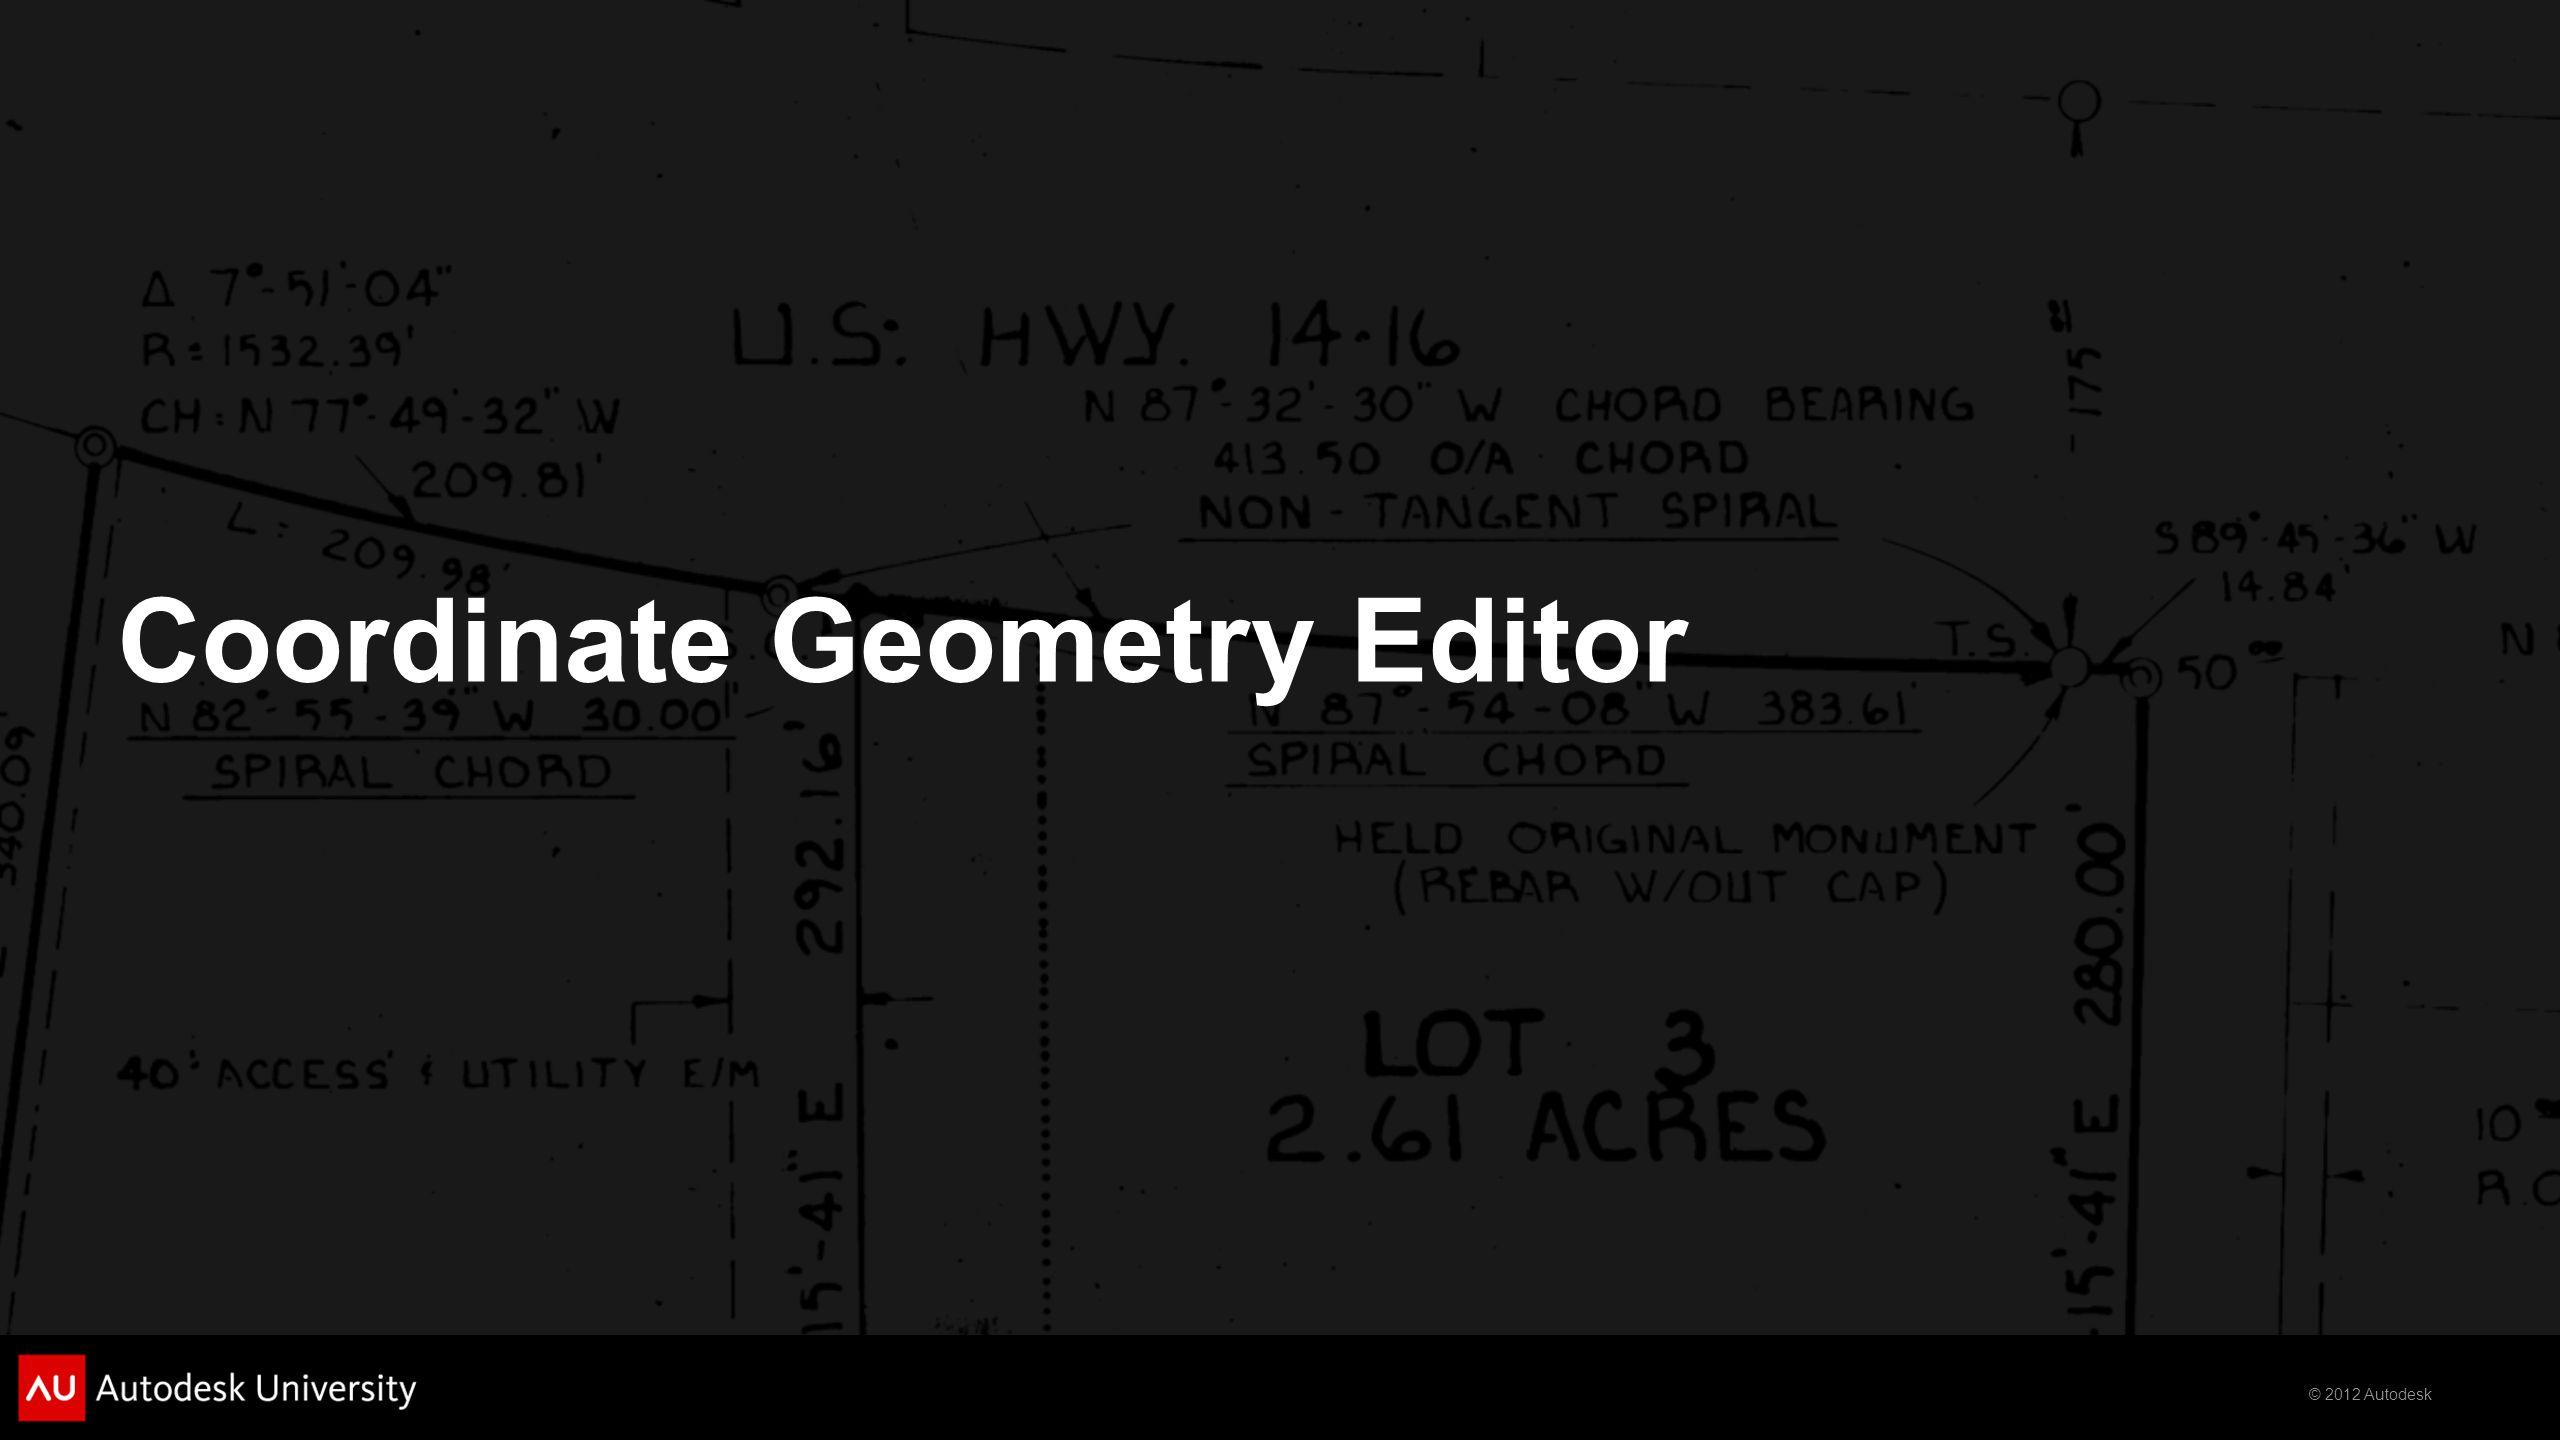 Coordinate Geometry Editor